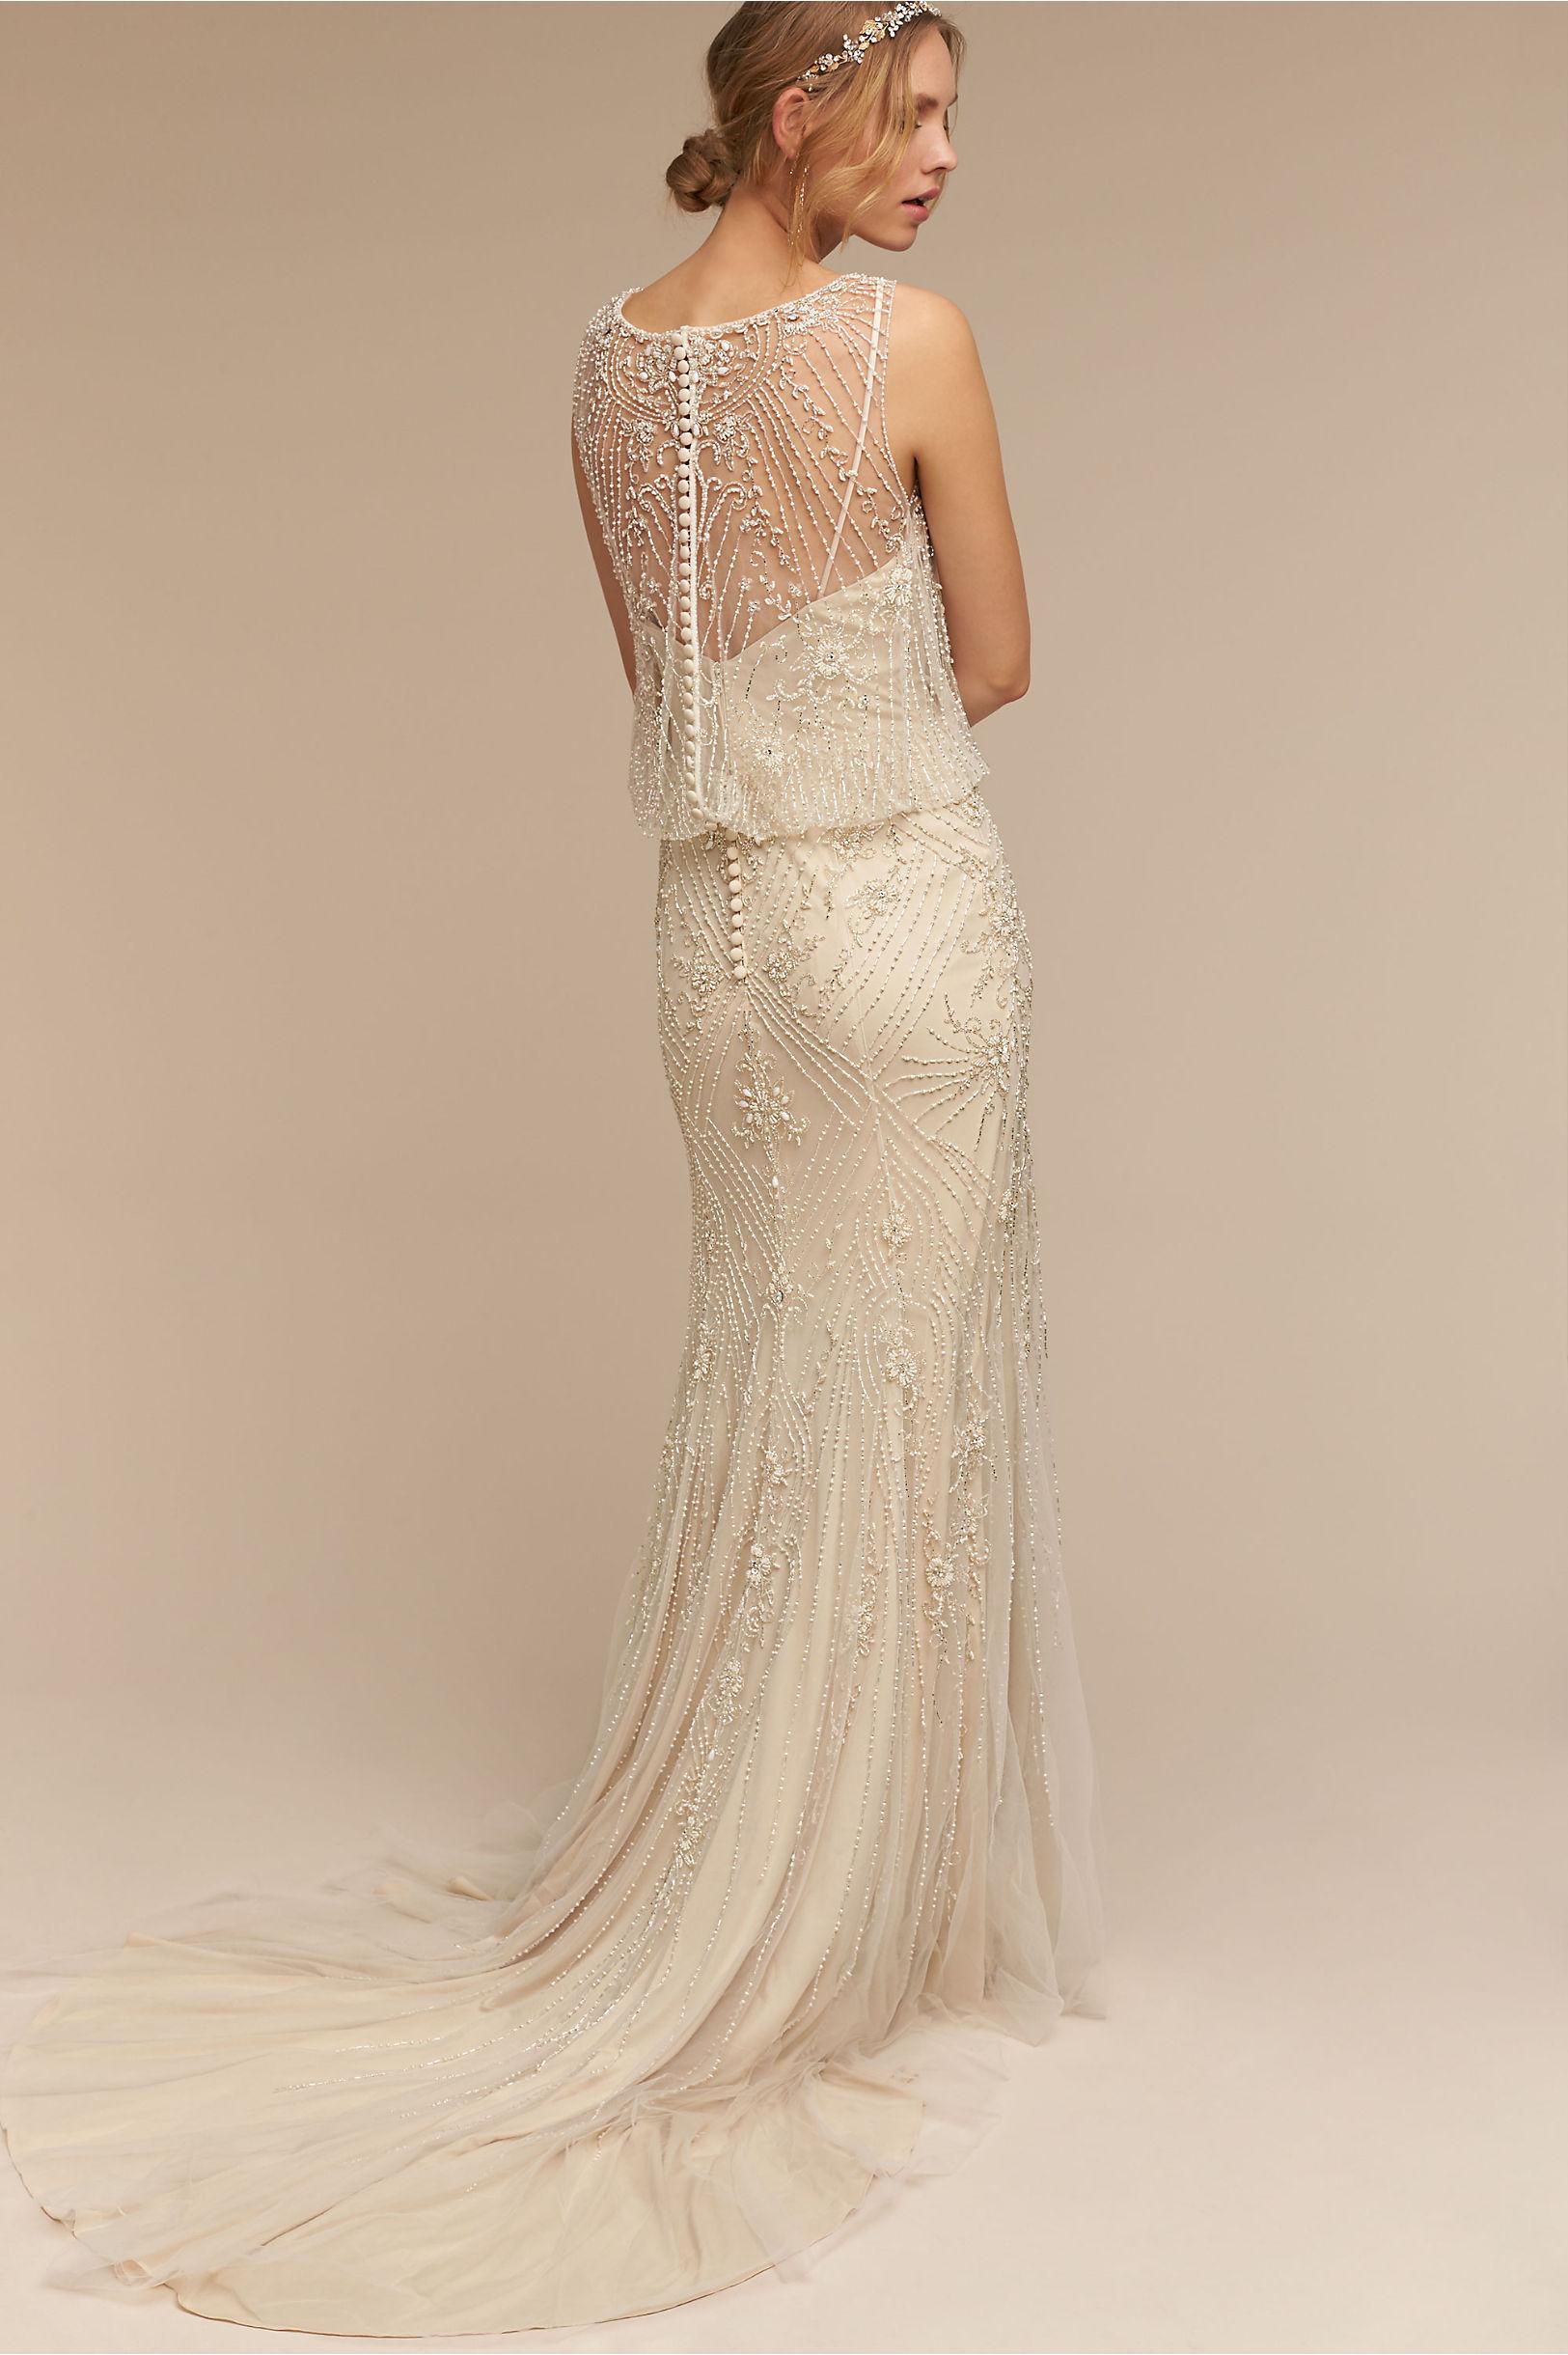 Jacinda Gown Ivory/Champagne in Bride | BHLDN